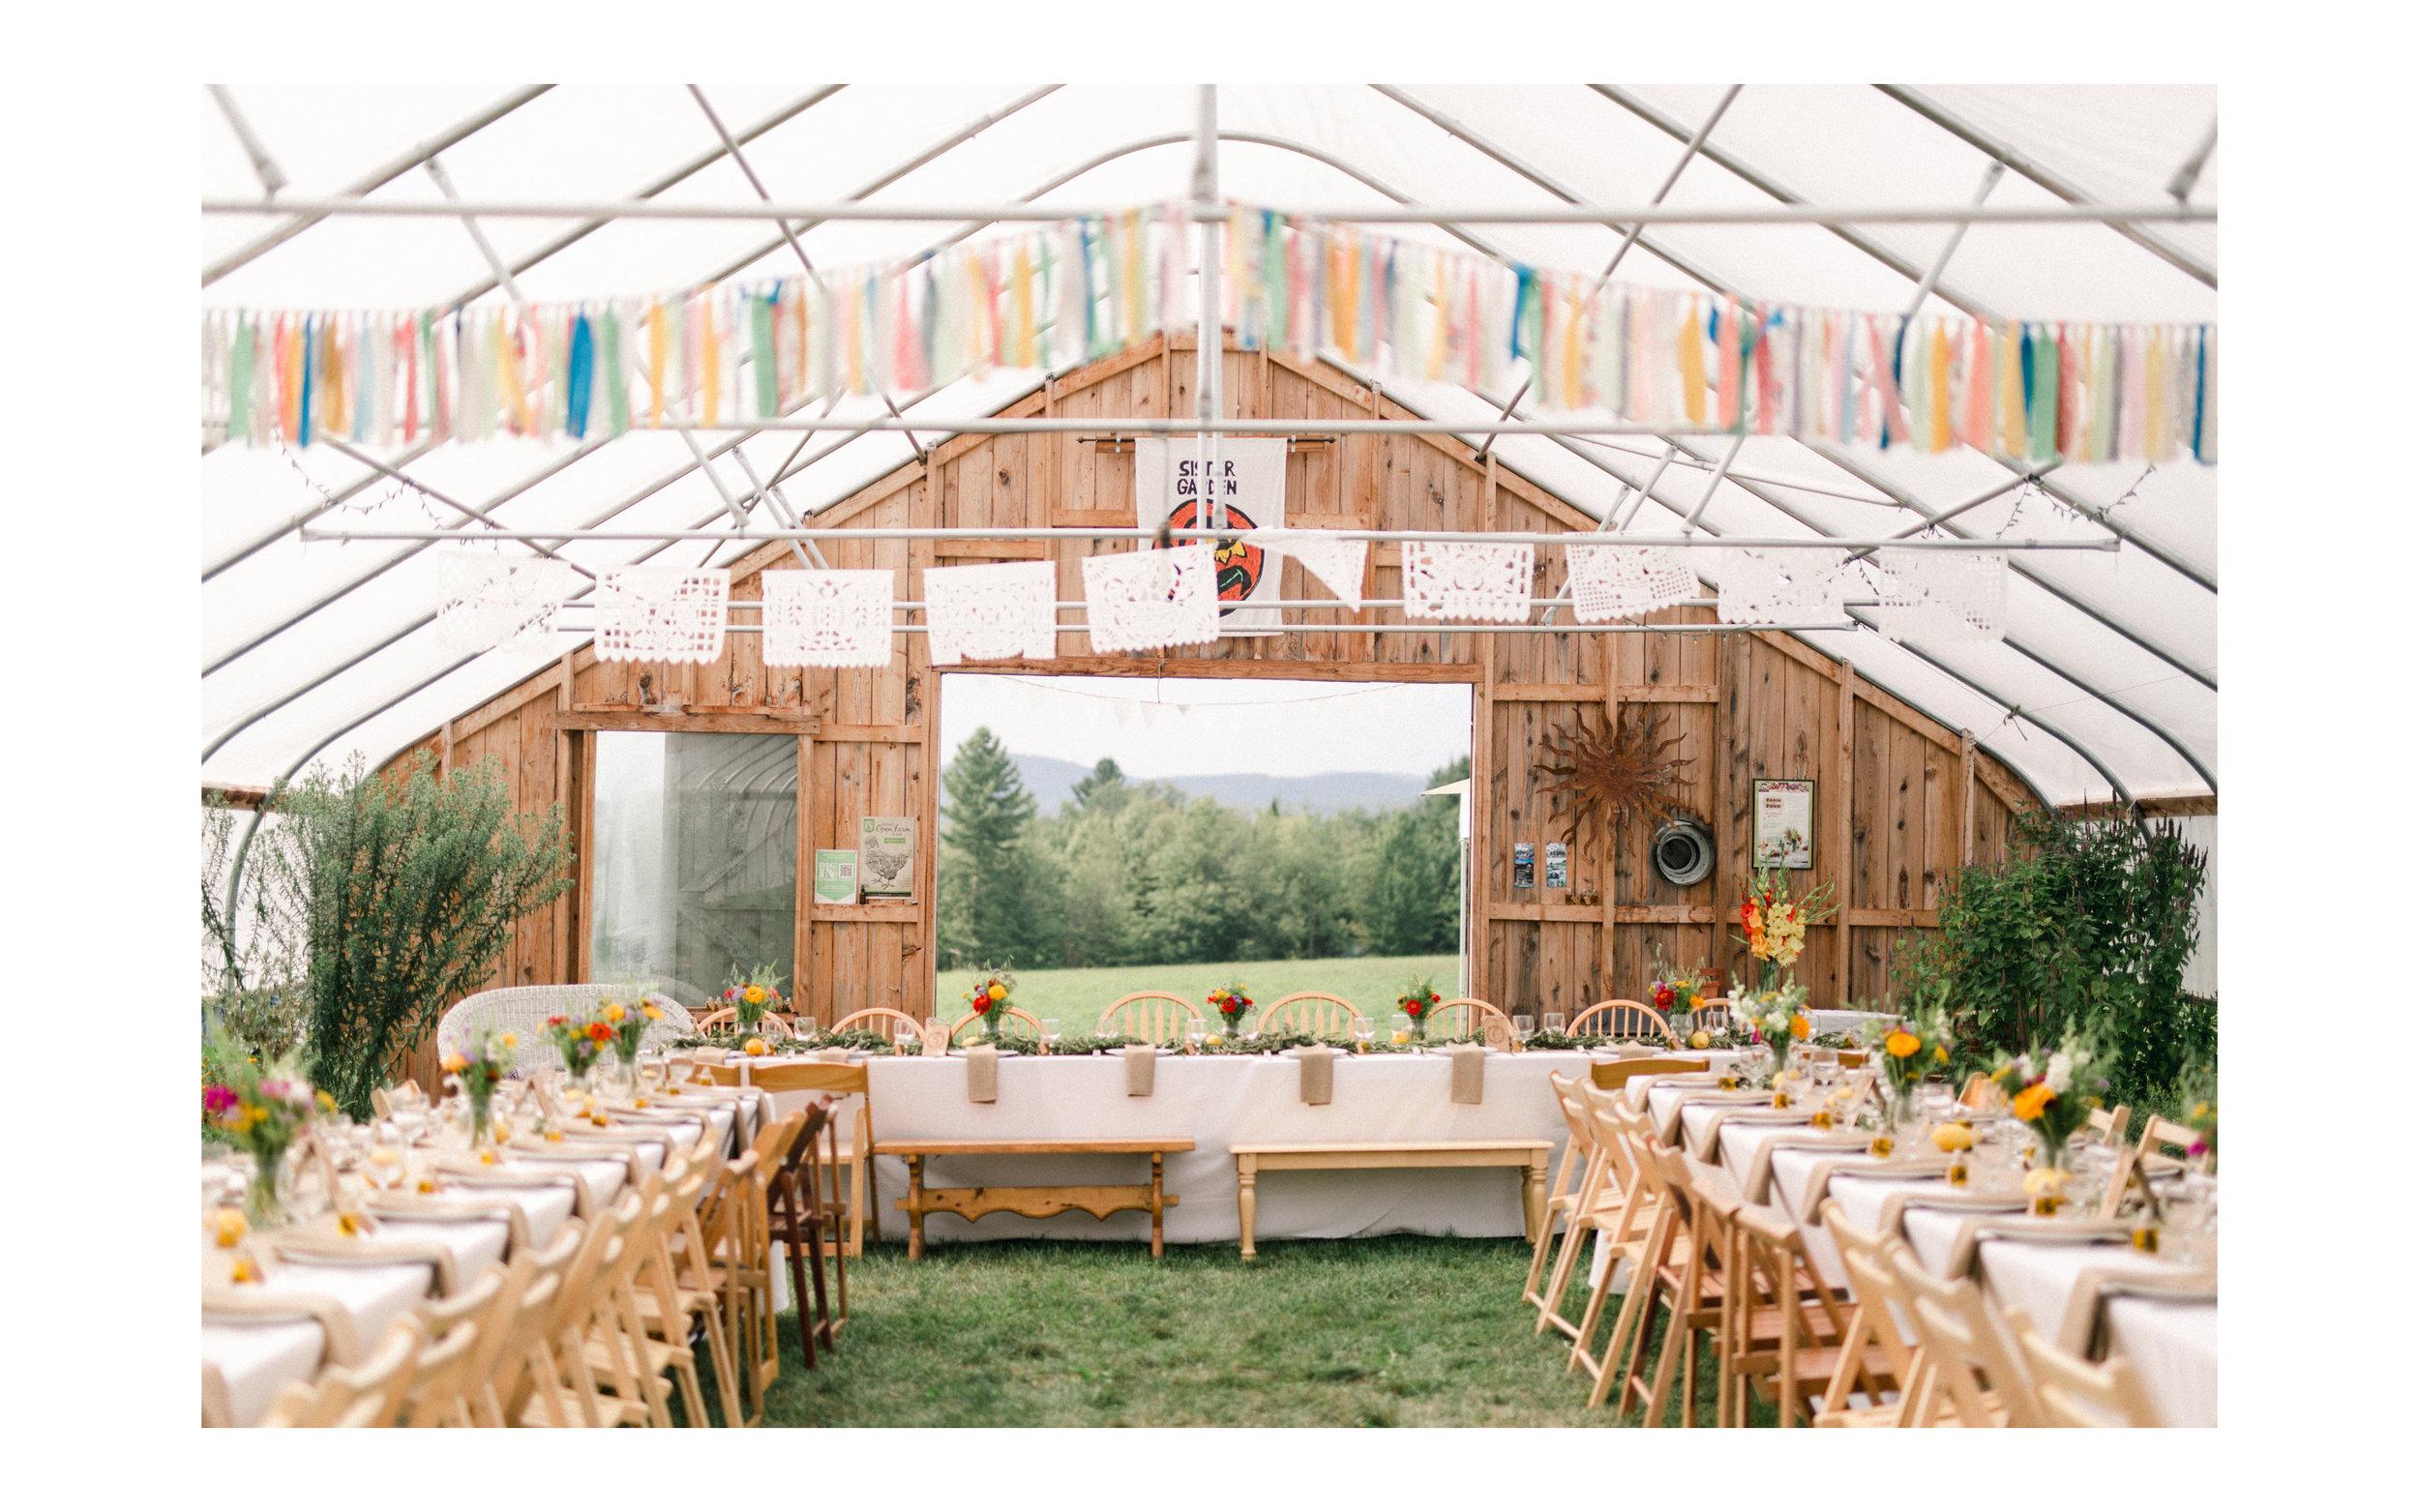 Stowe VT Farm Wedding Fine Art Wedding Photographer_Meg Haley Photographs_033.jpg